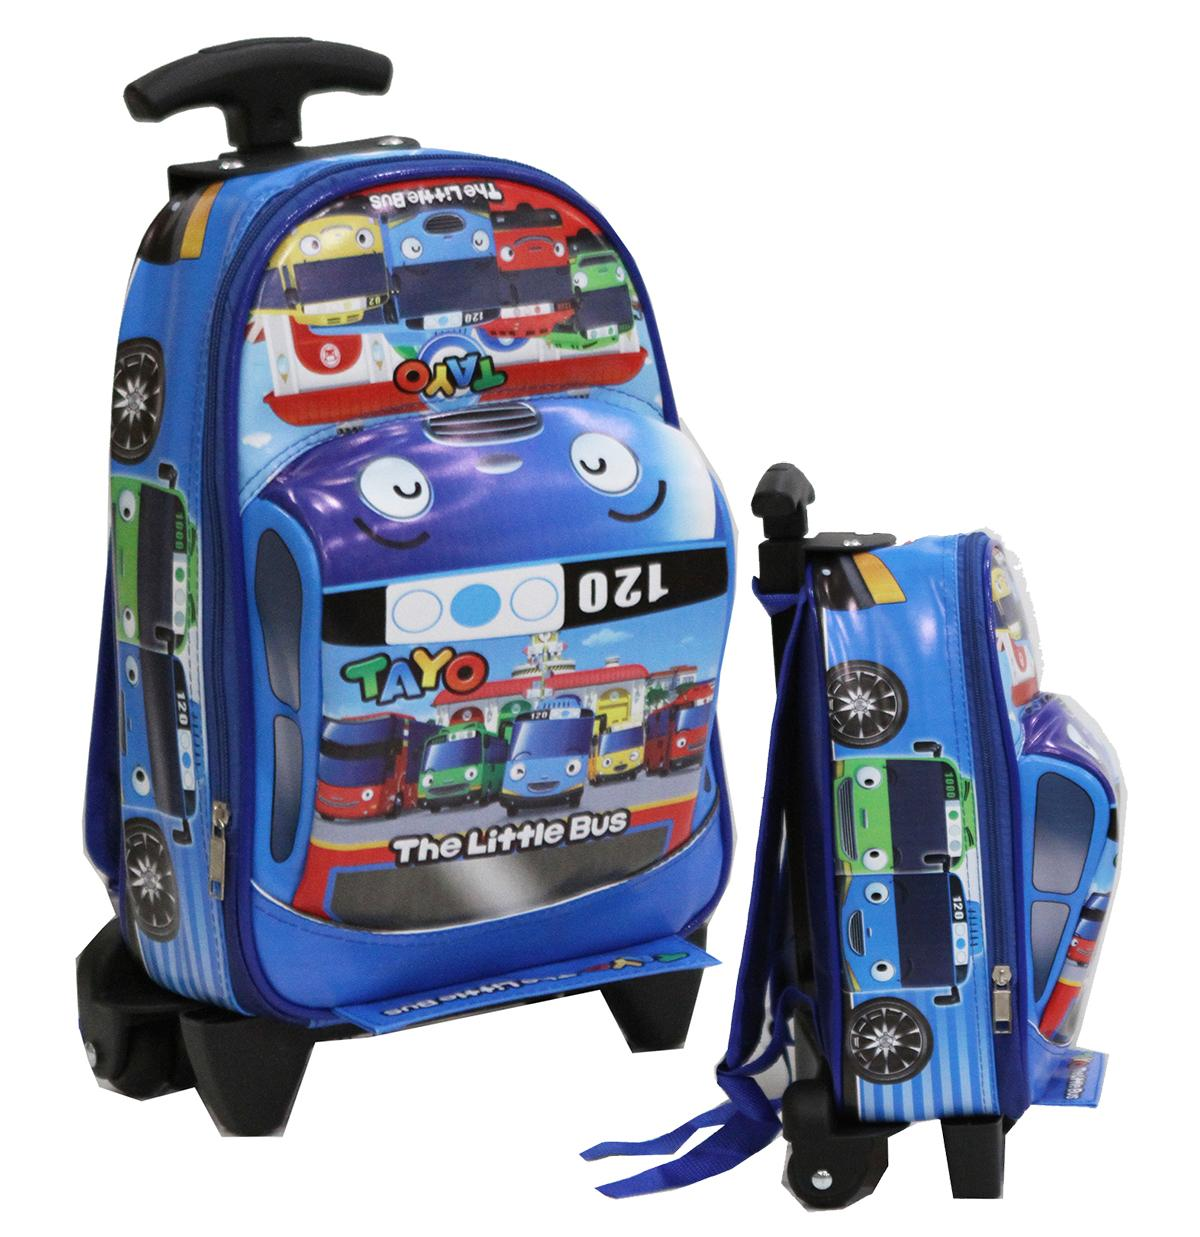 Onlan Cars Mcqueen - Batman - Tobot - Doraemon Tas Trolley Anak Sekolah Paud Bentuk Mobil Racing By Abadi Jaya.